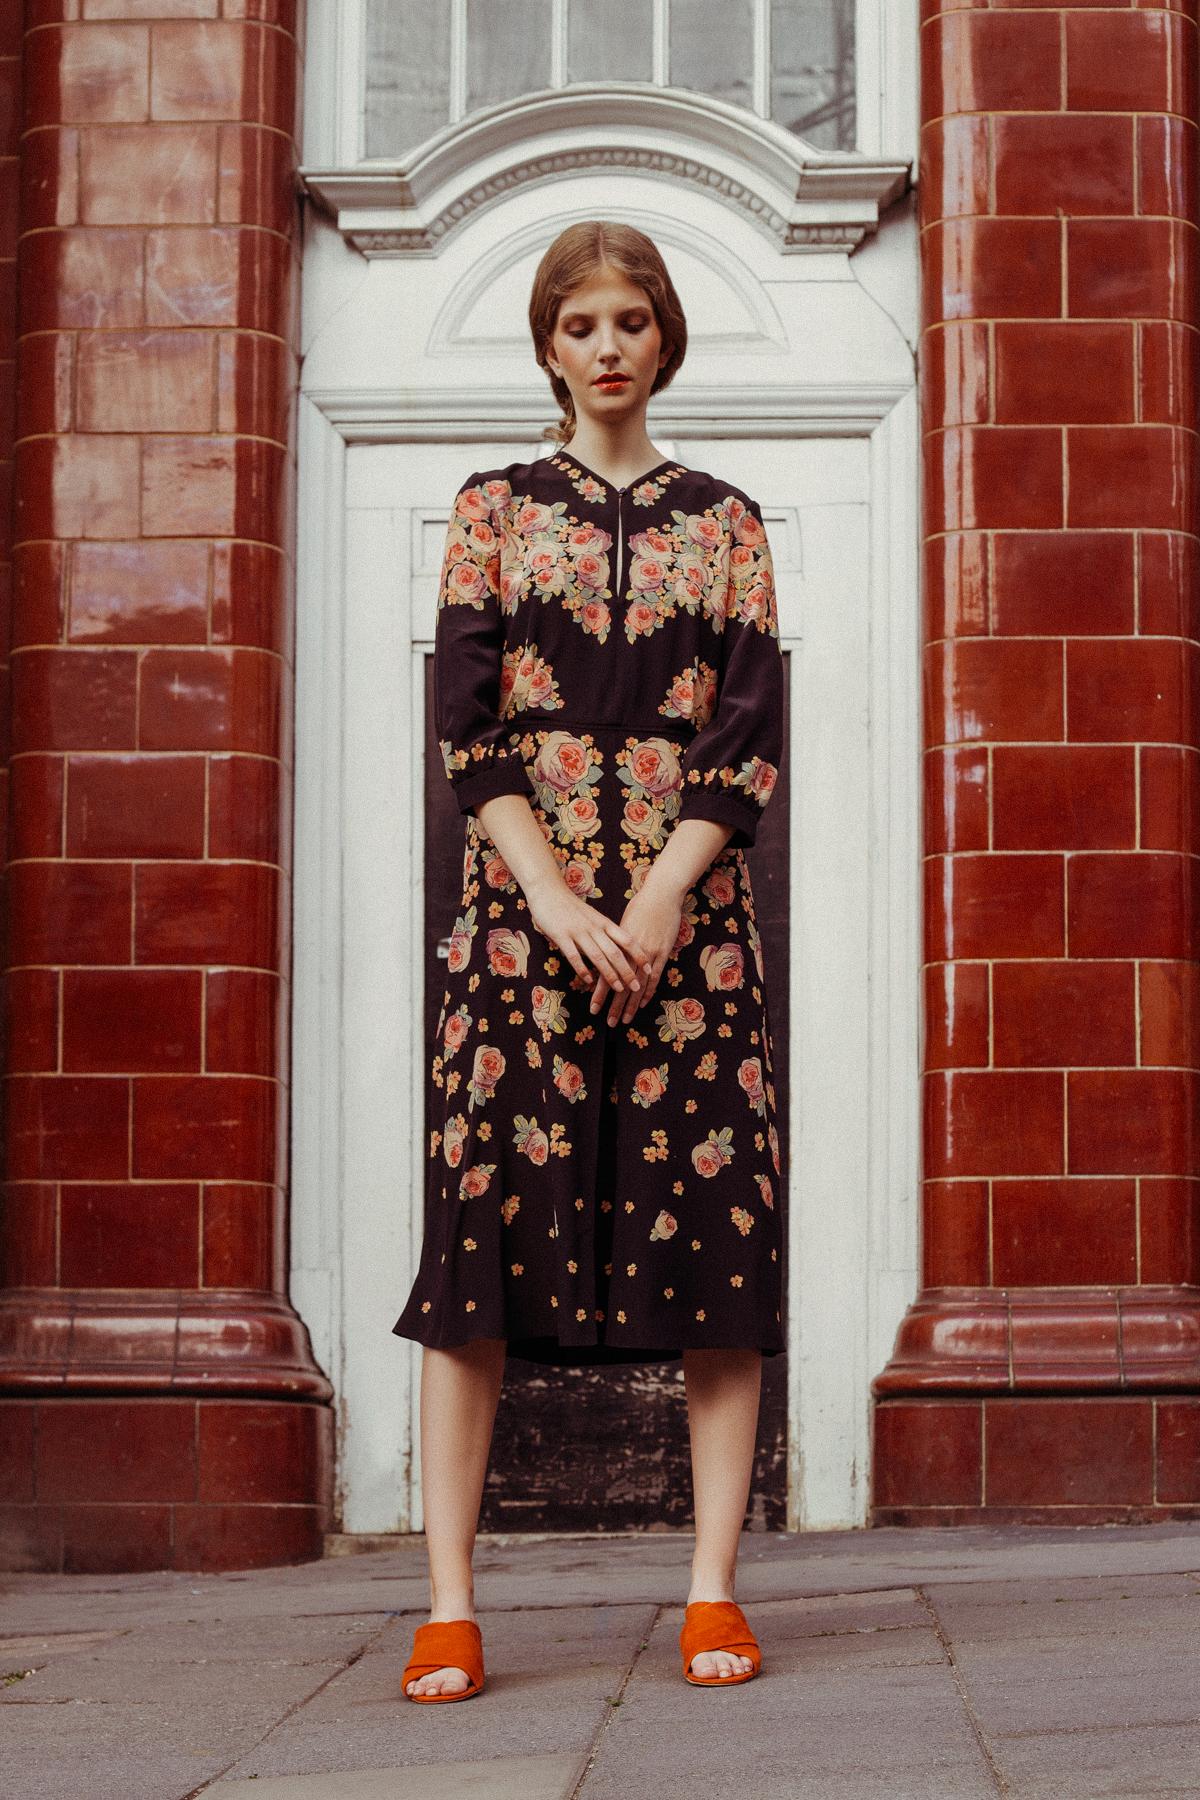 Kat_Terek_London_Bohemian_Editorial_Fashion_Photographer_Lindenstaub_Bronze-10